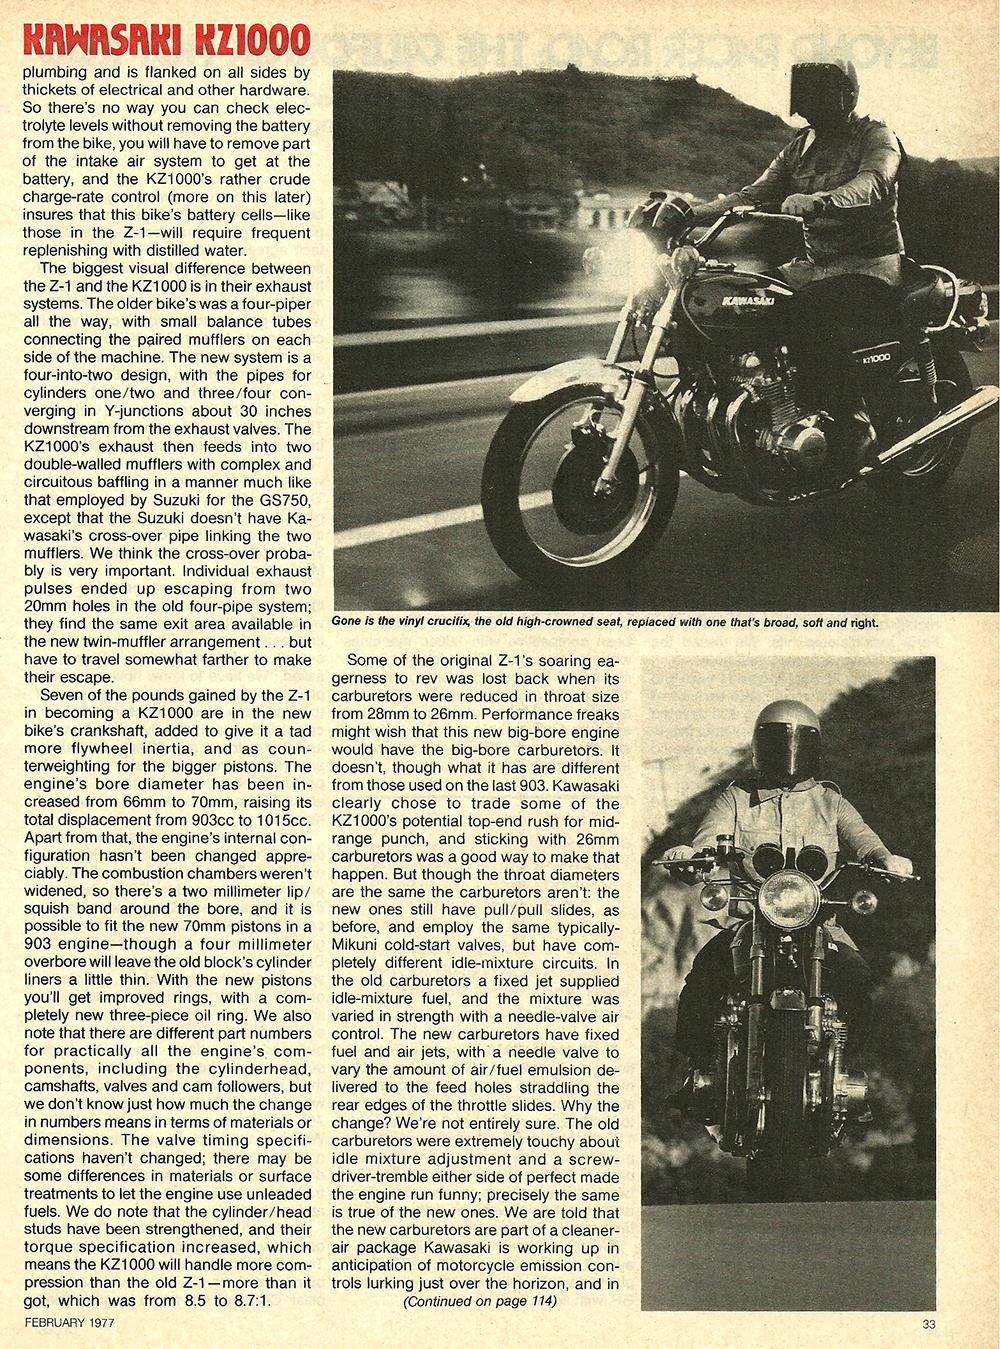 1977 Kawasaki KZ1000 road test 6.jpg